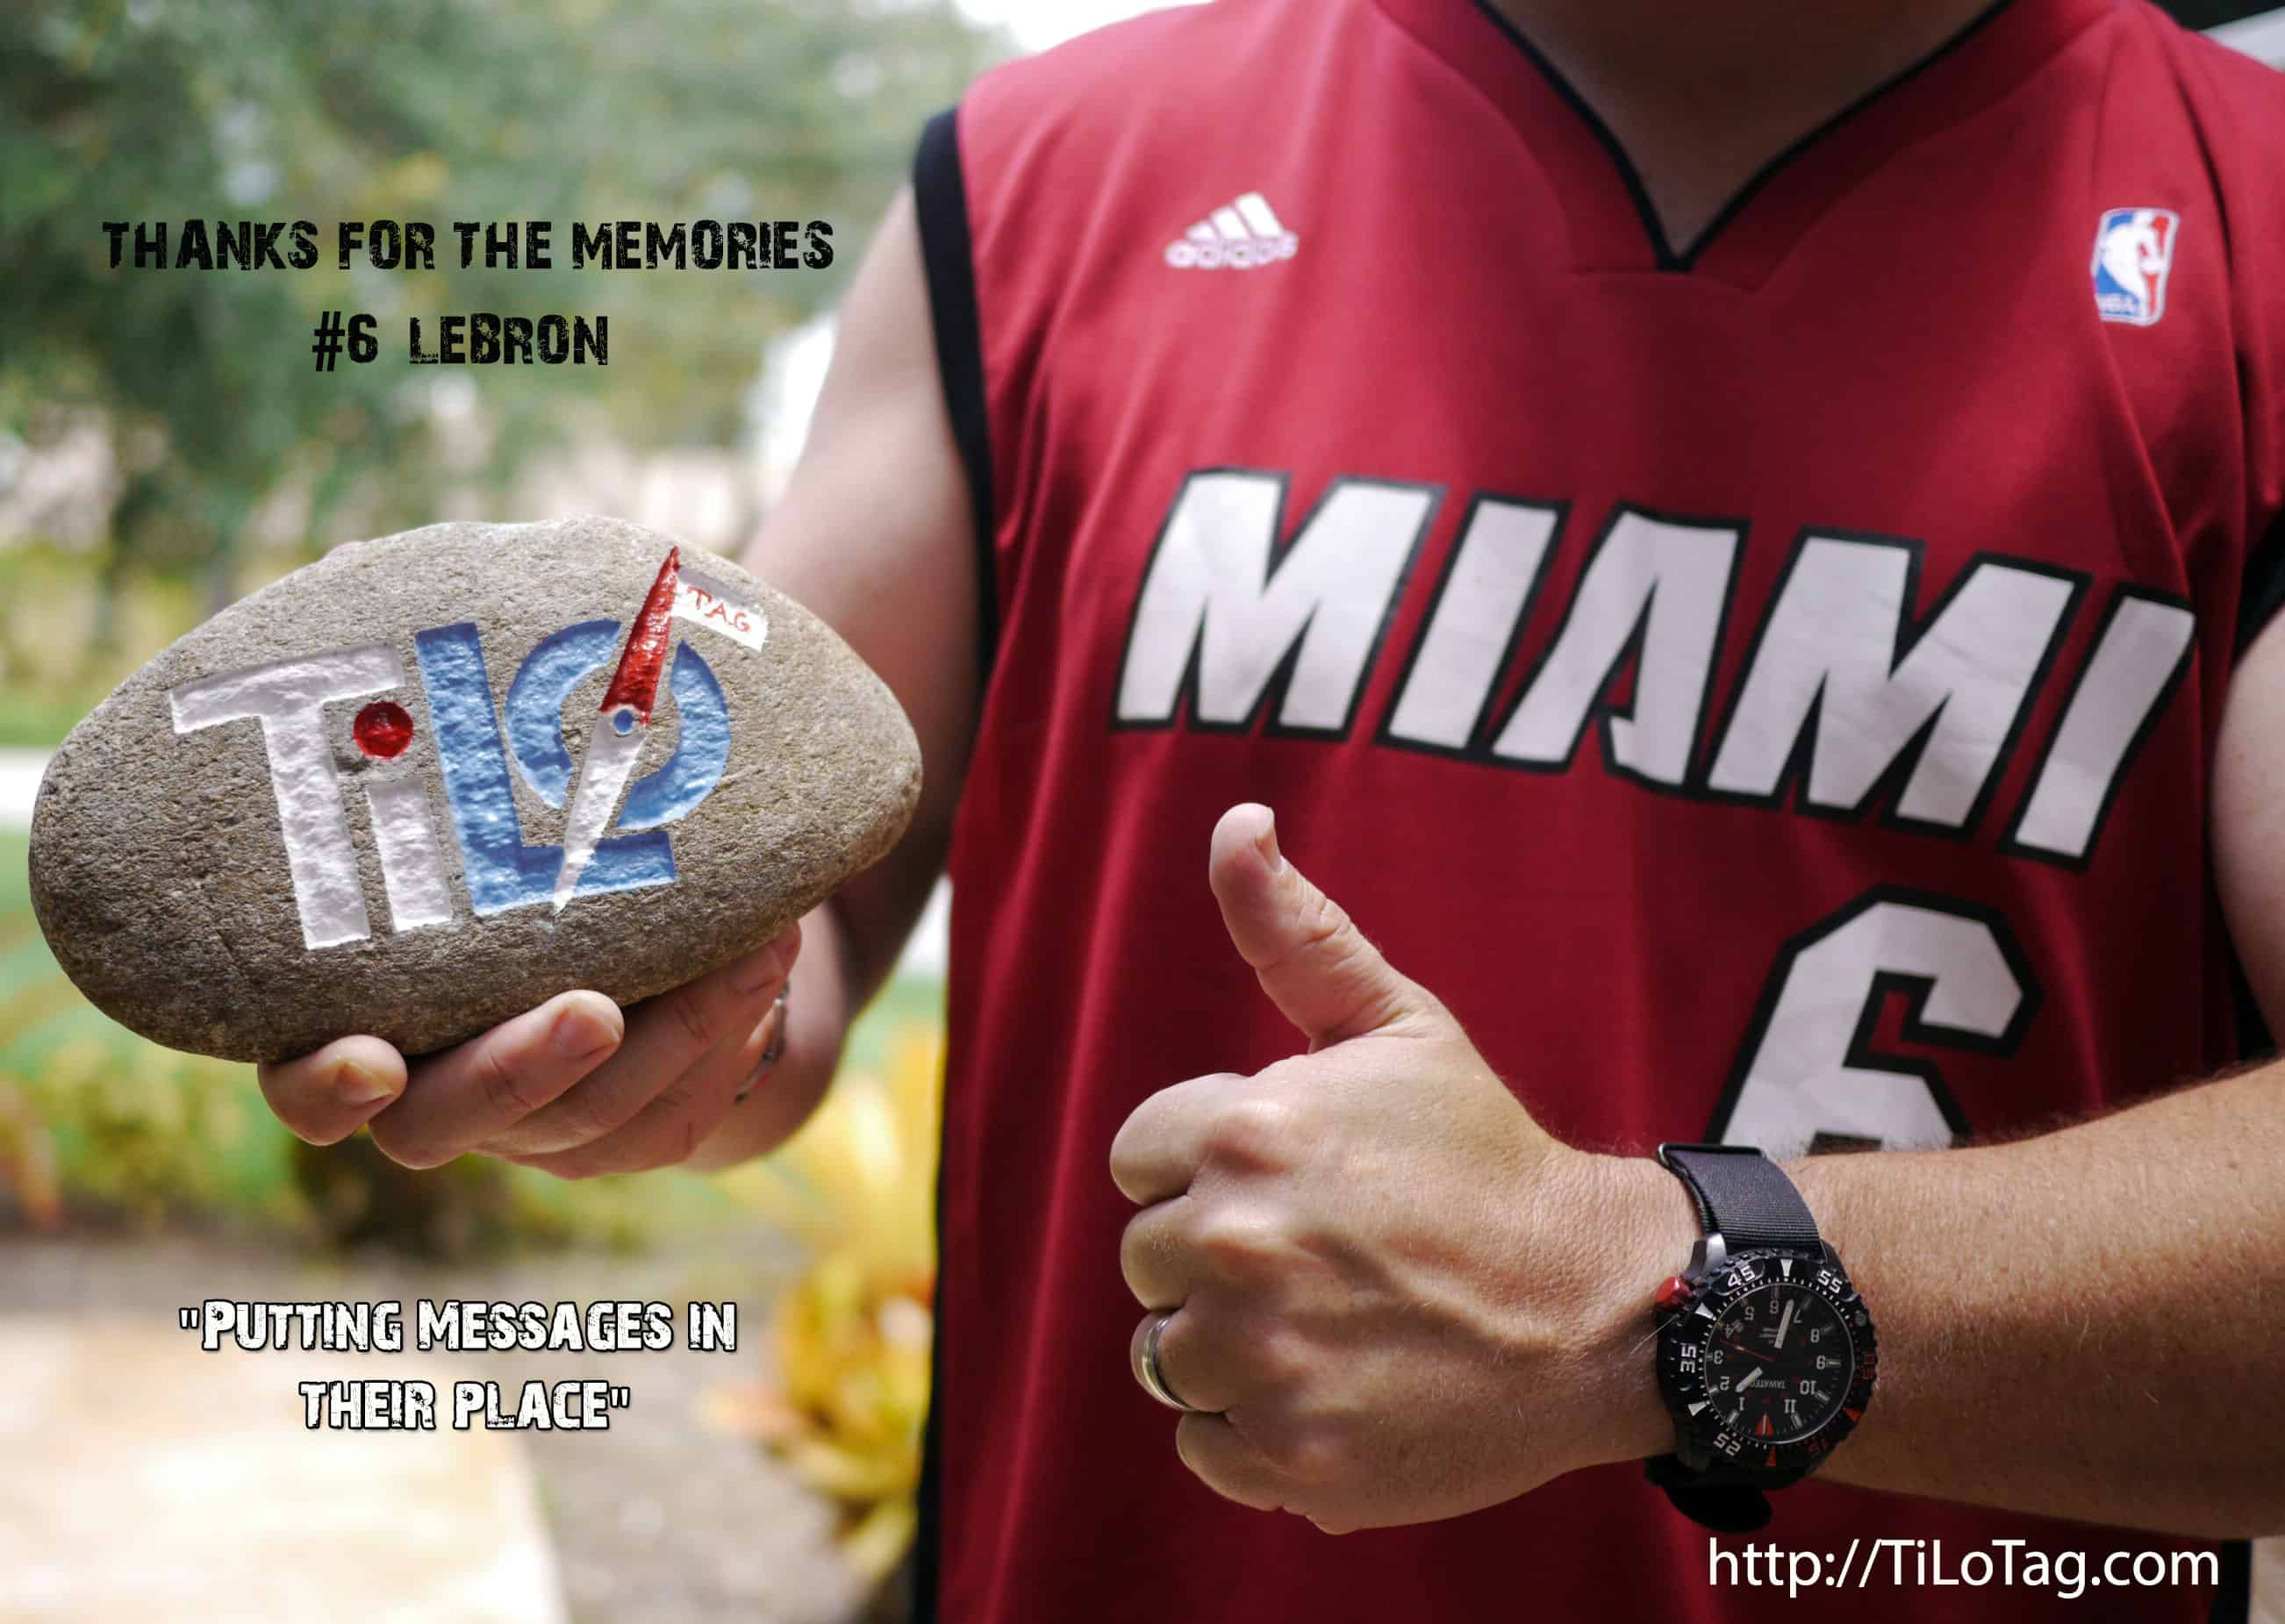 #6 LeBron, I'm keeping my jersey!